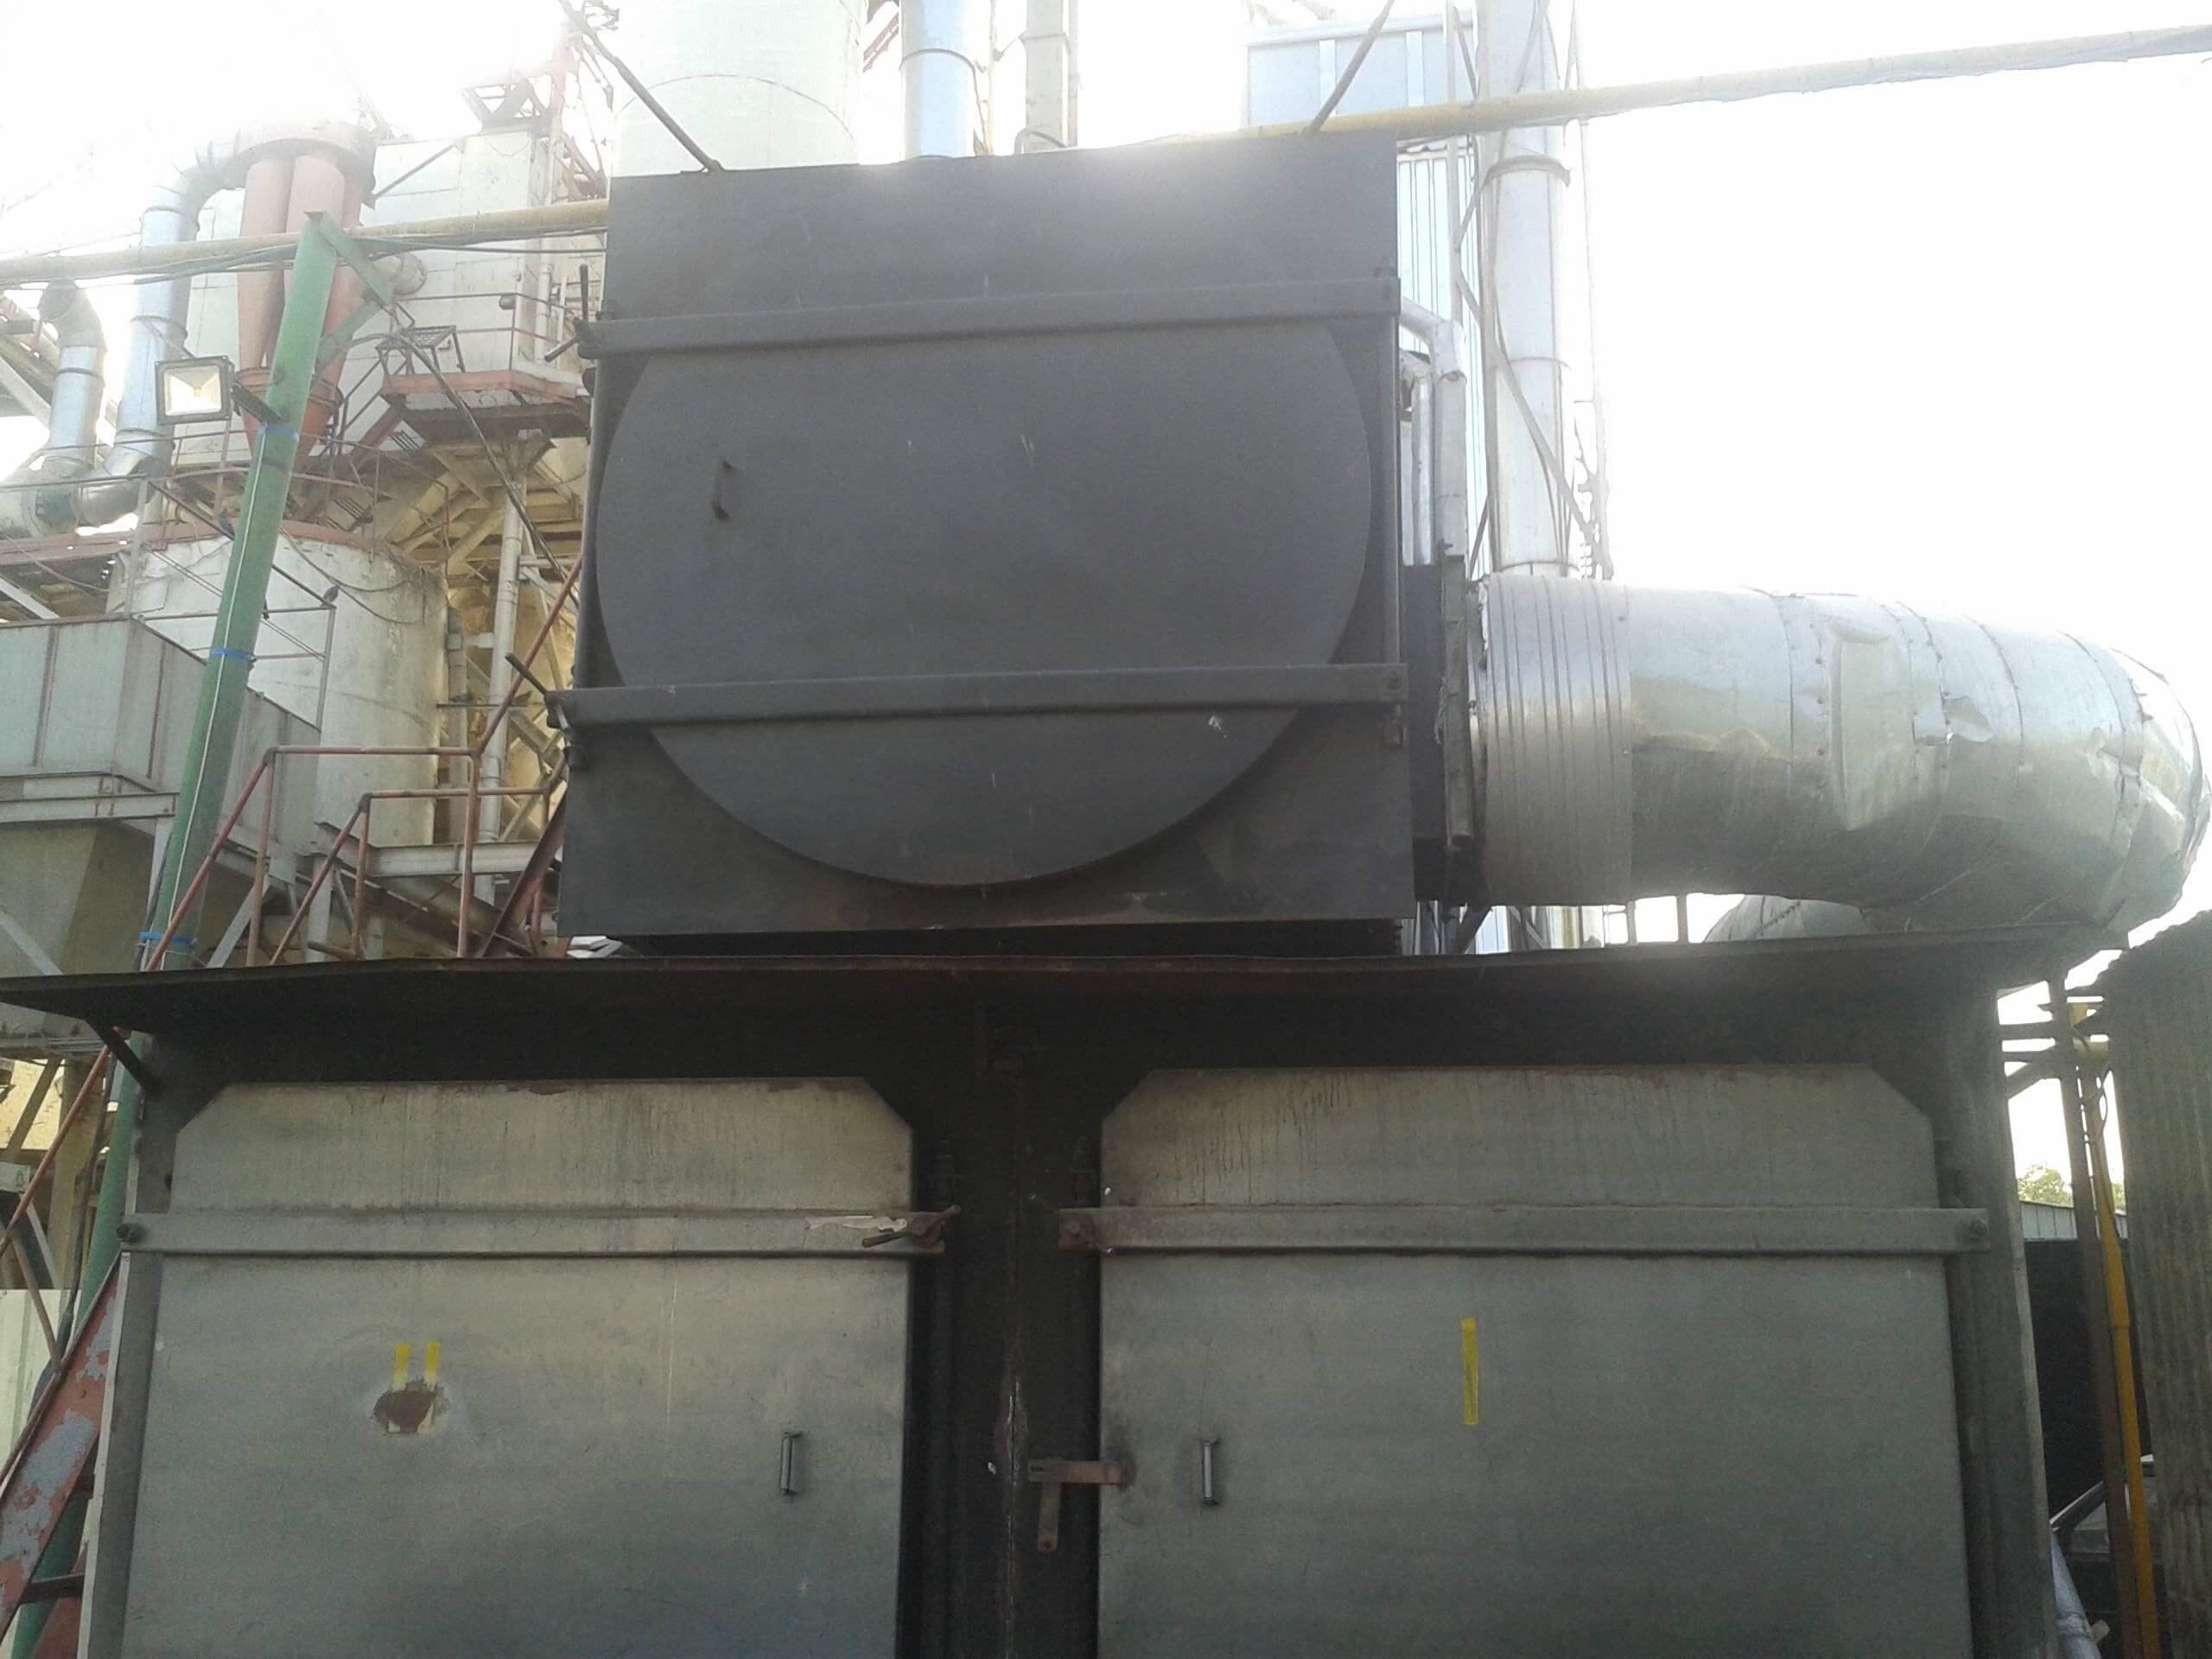 Теплообменник для сушки газа Пластинчатый теплообменник Kelvion NT 250M Королёв